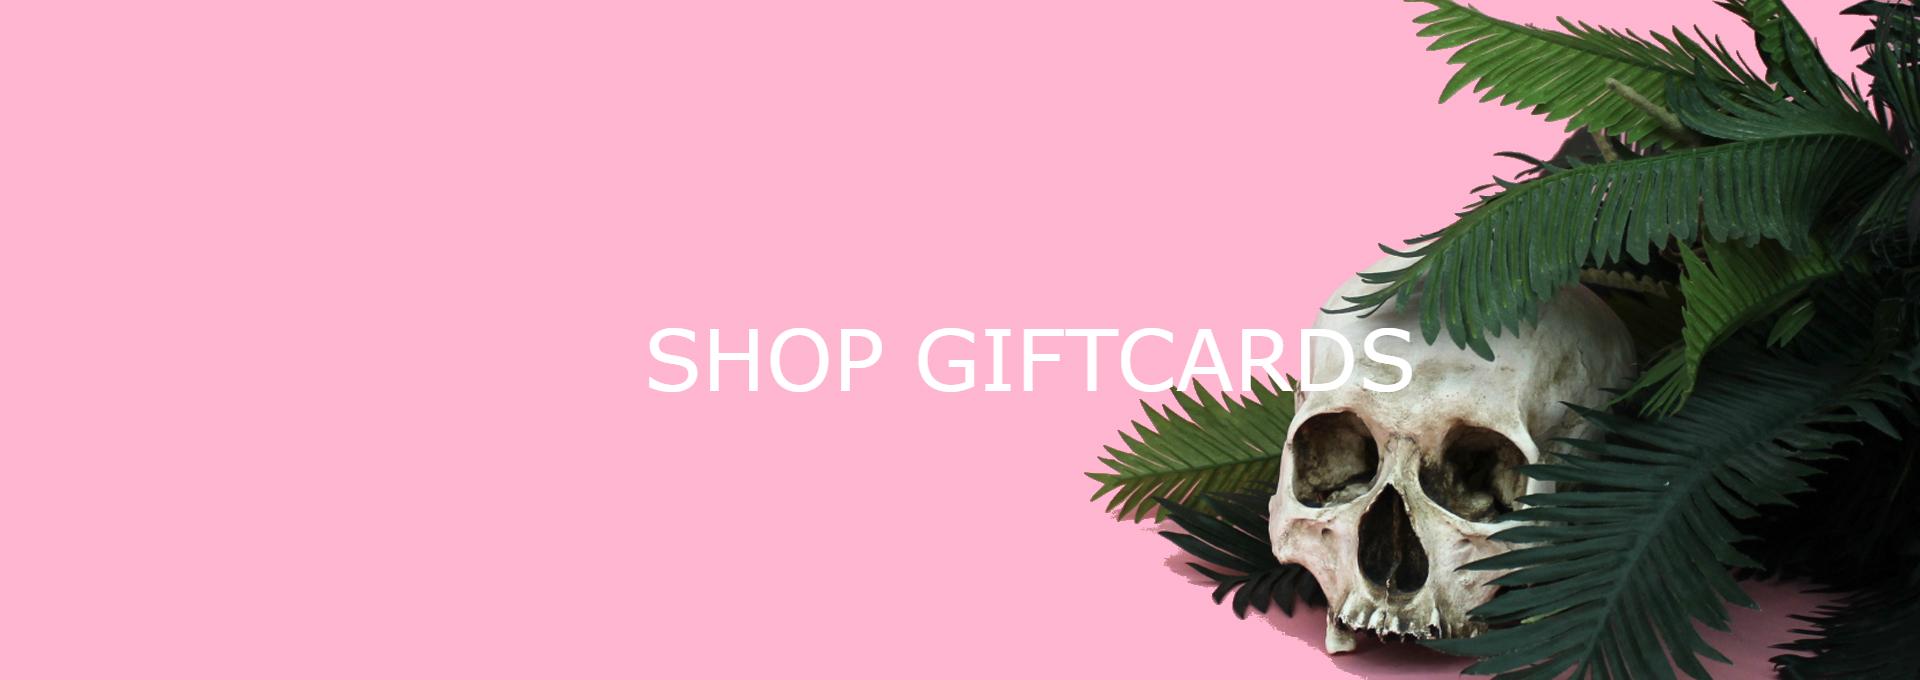 shopgiftcards.jpg